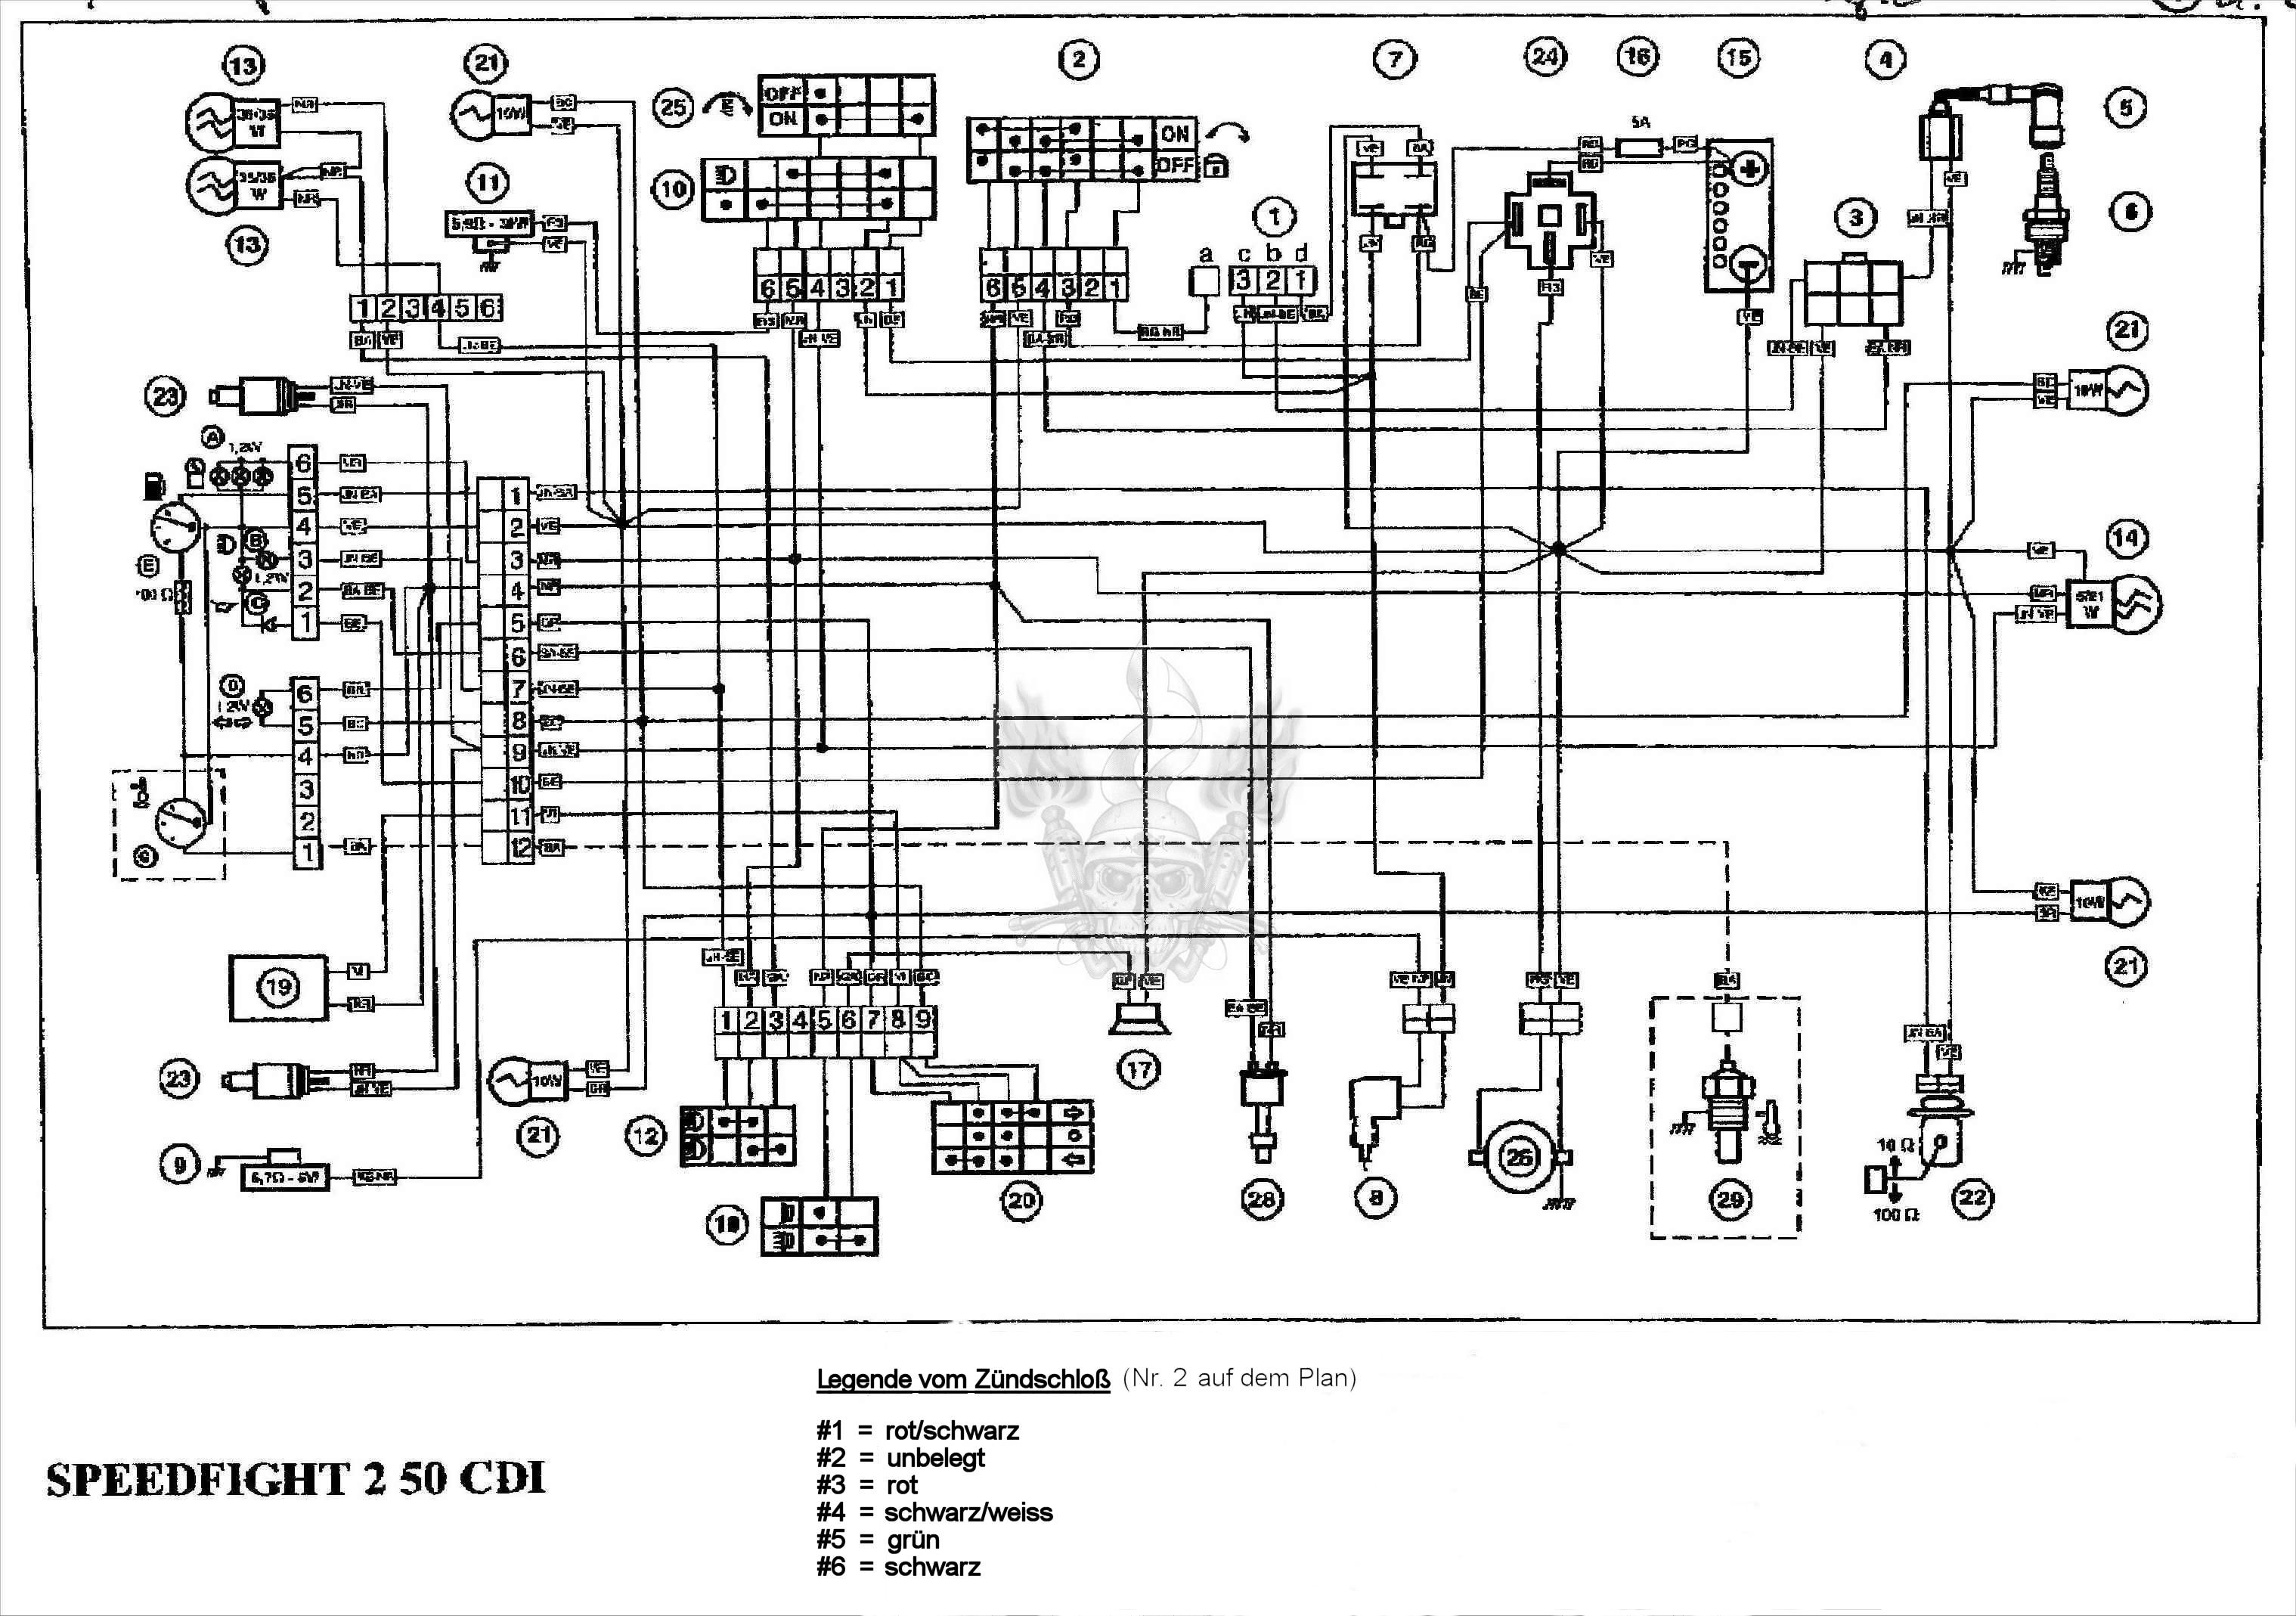 American Ironhorse Wiring Diagram Pdf Haulmark Trailer Qiye 110cc Mini Chopper Coil Peugeot Motorcycle Manuals Diagrams Fault Codes